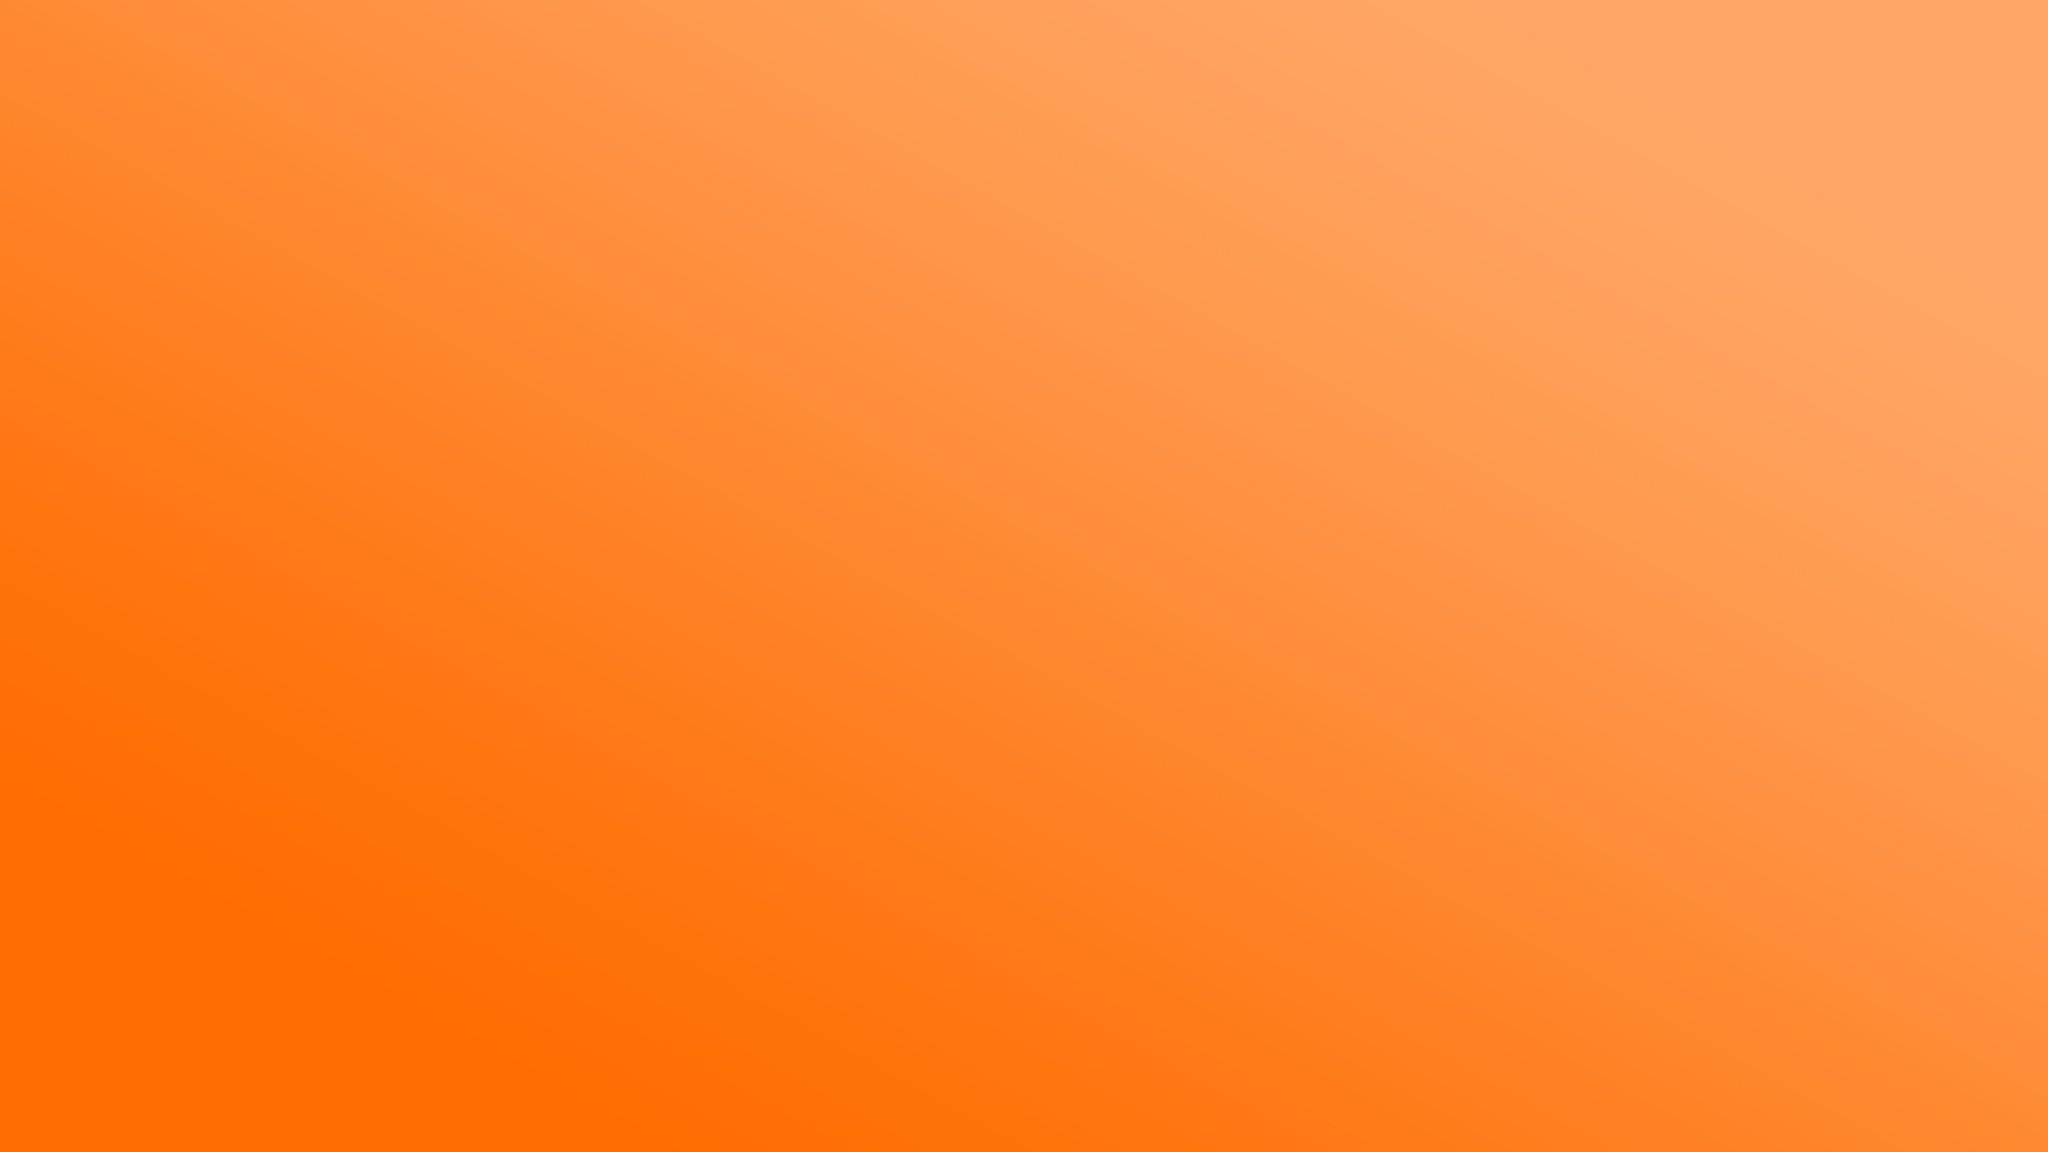 Preview wallpaper orange, white, solid, colorful 2048×1152